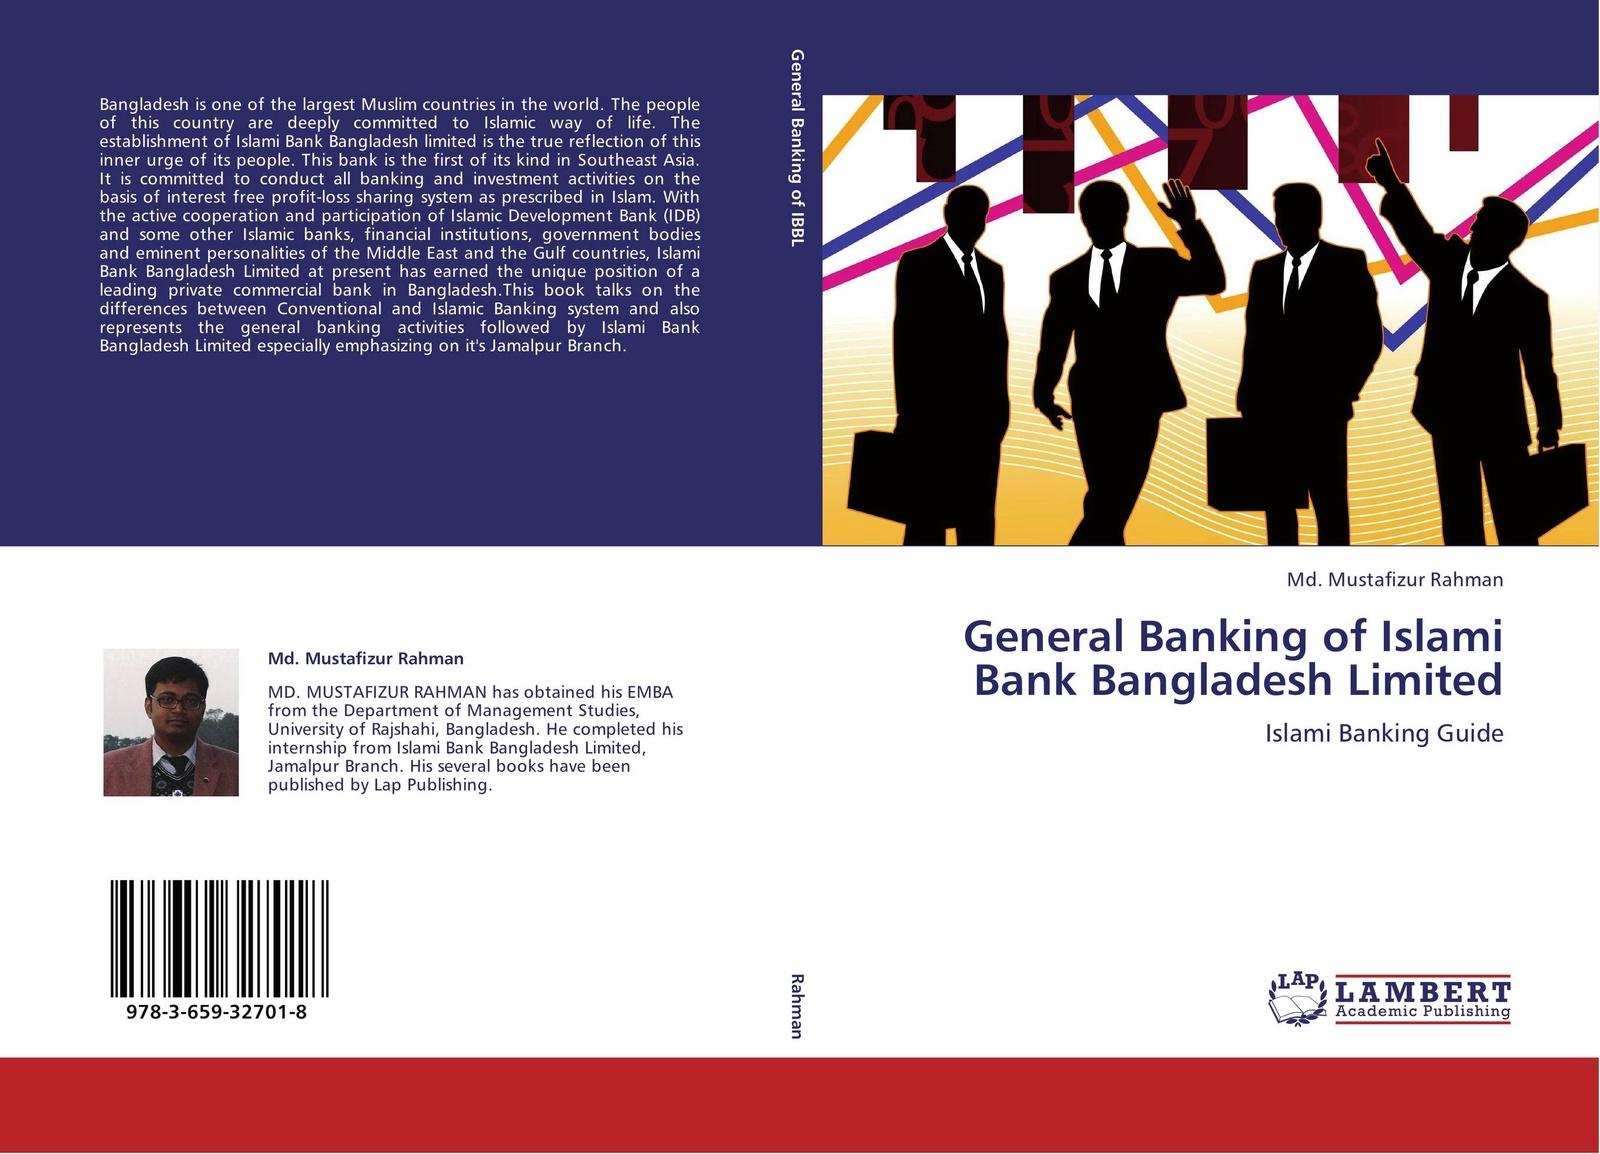 купить Md. Mustafizur Rahman General Banking of Islami Bank Bangladesh Limited по цене 4749 рублей